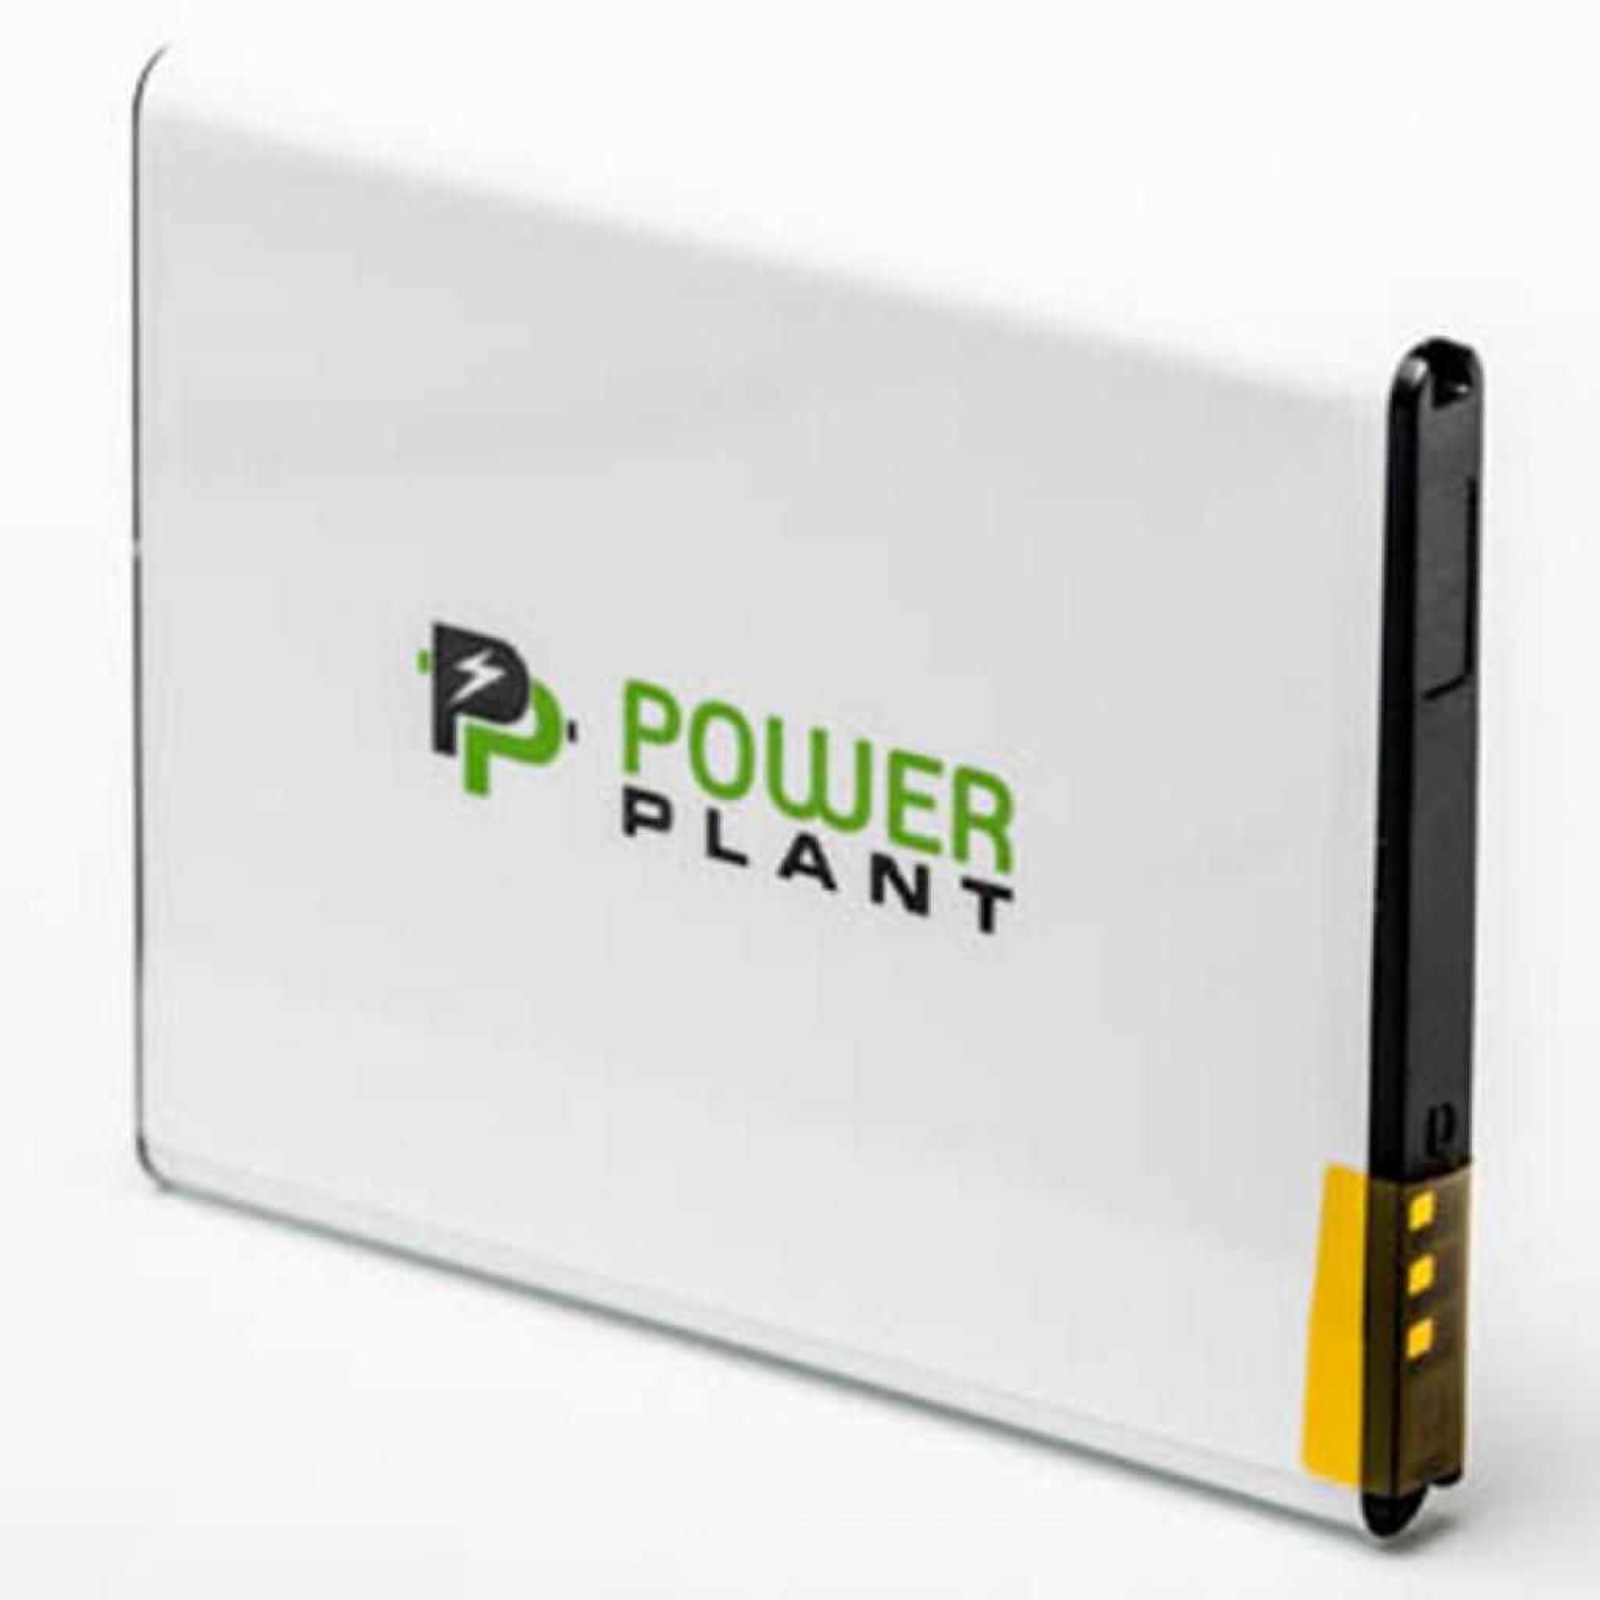 Аккумуляторная батарея PowerPlant Samsung T759 (DV00DV6117) изображение 2